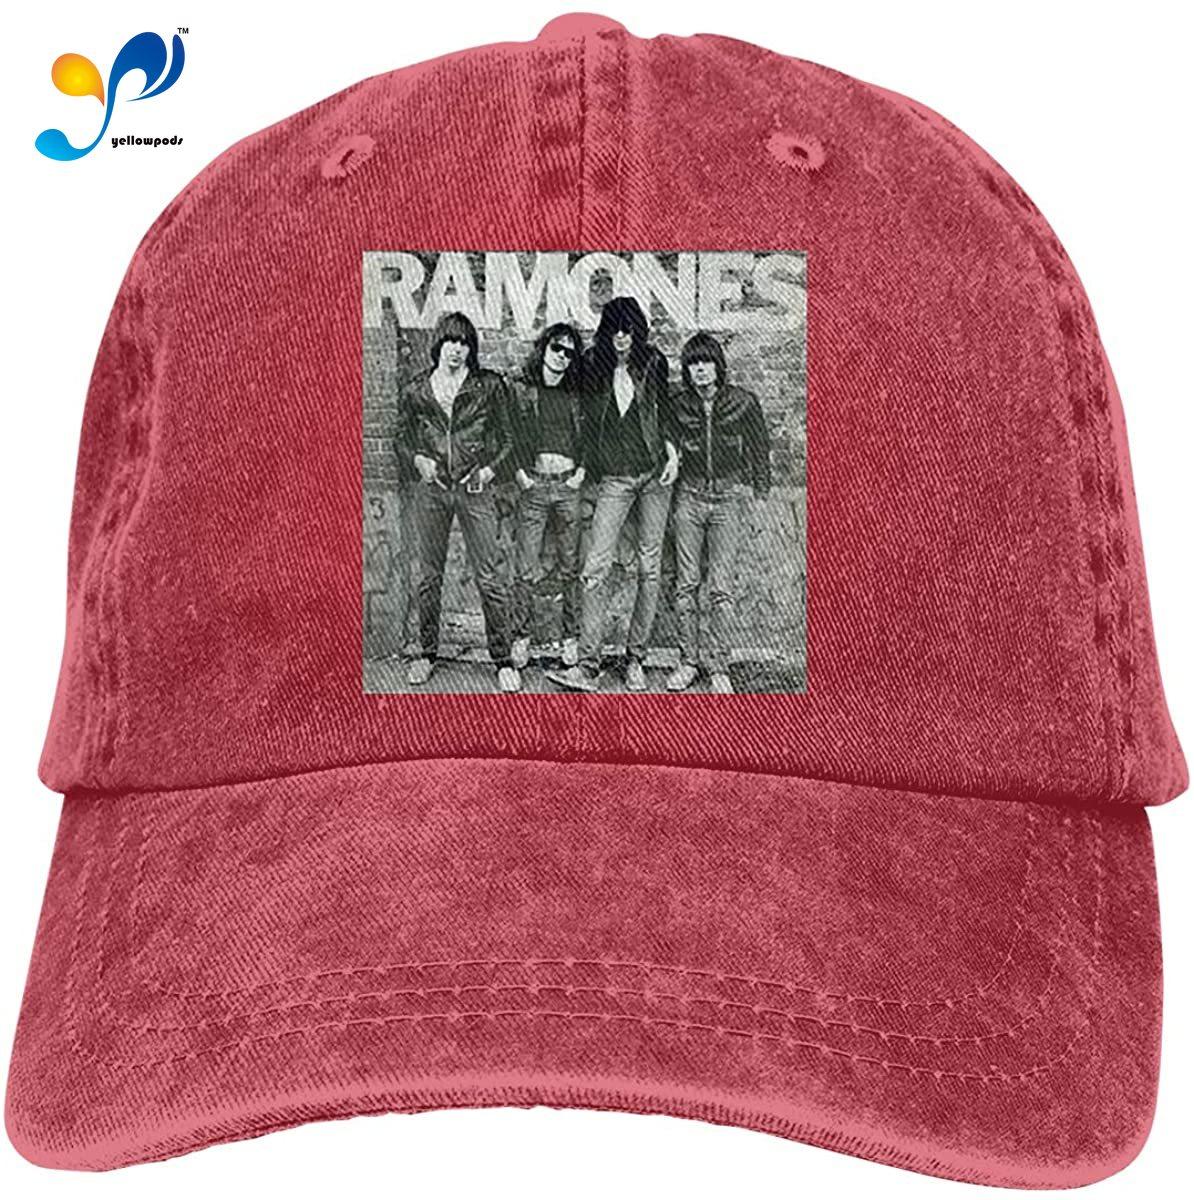 Commemorate Casquette Cap Vintage Adjustable Unisex Baseball Hat